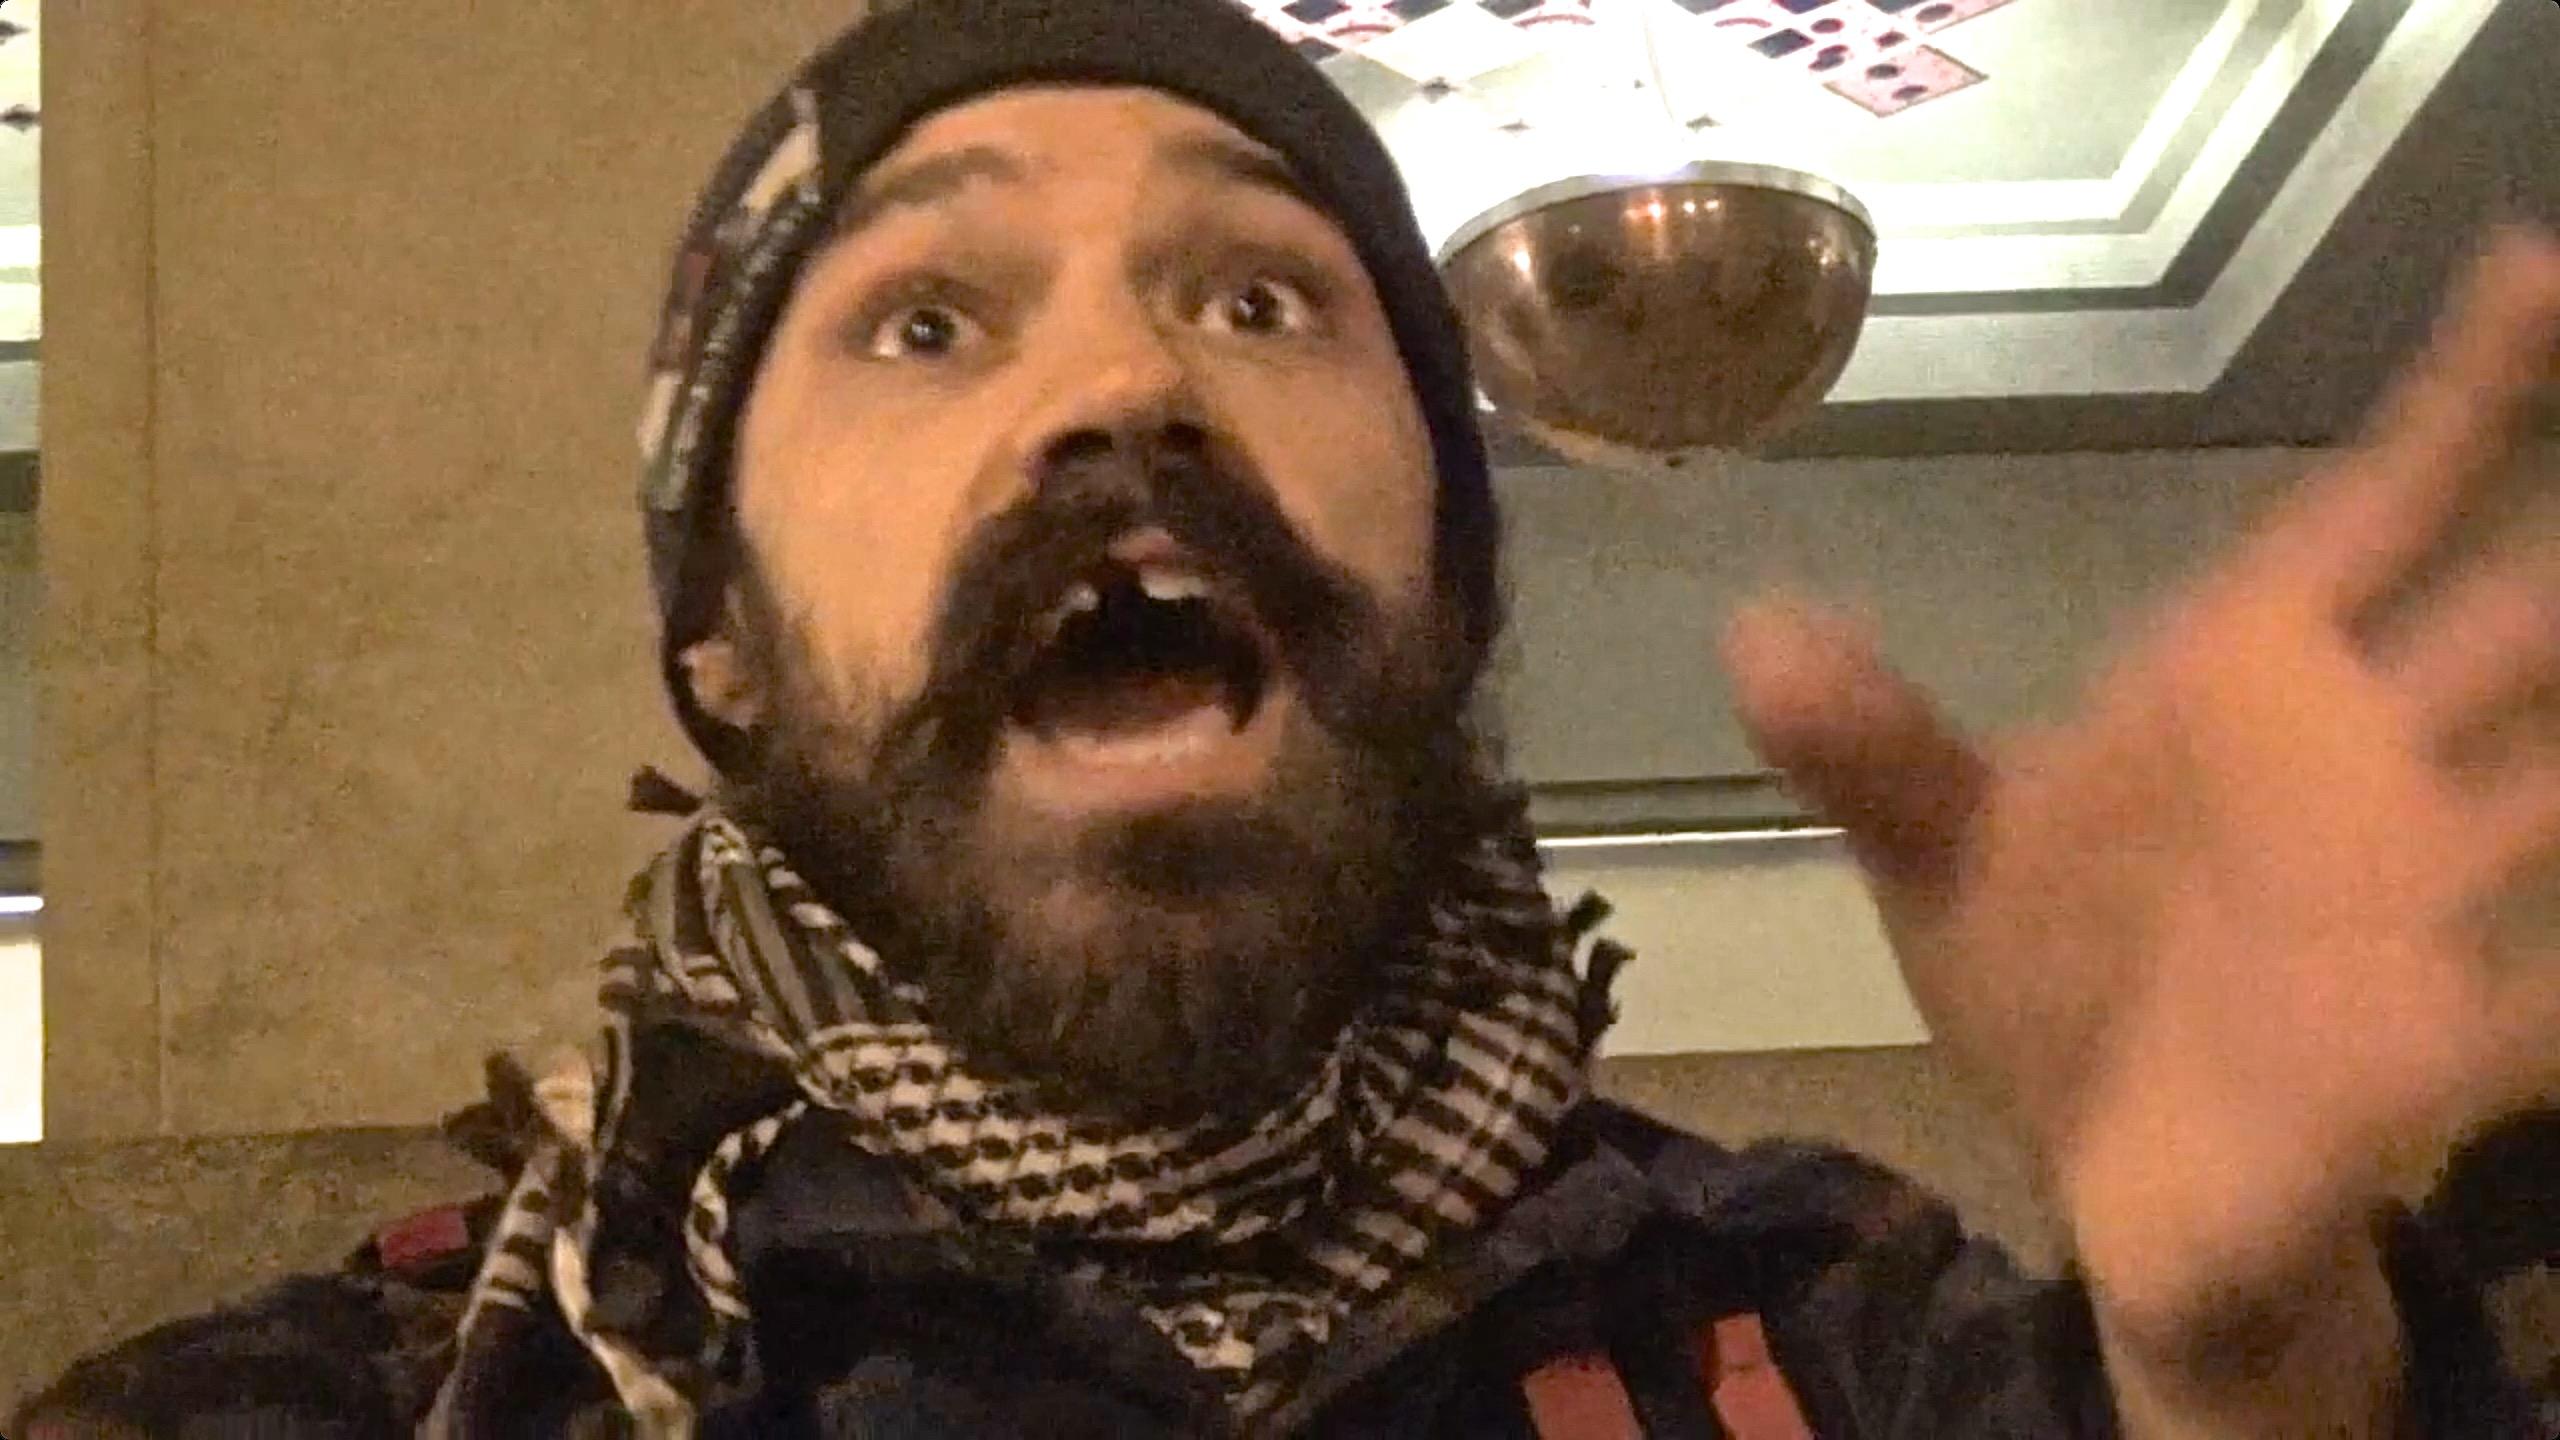 Violent Criminal Occupier Mario Haro